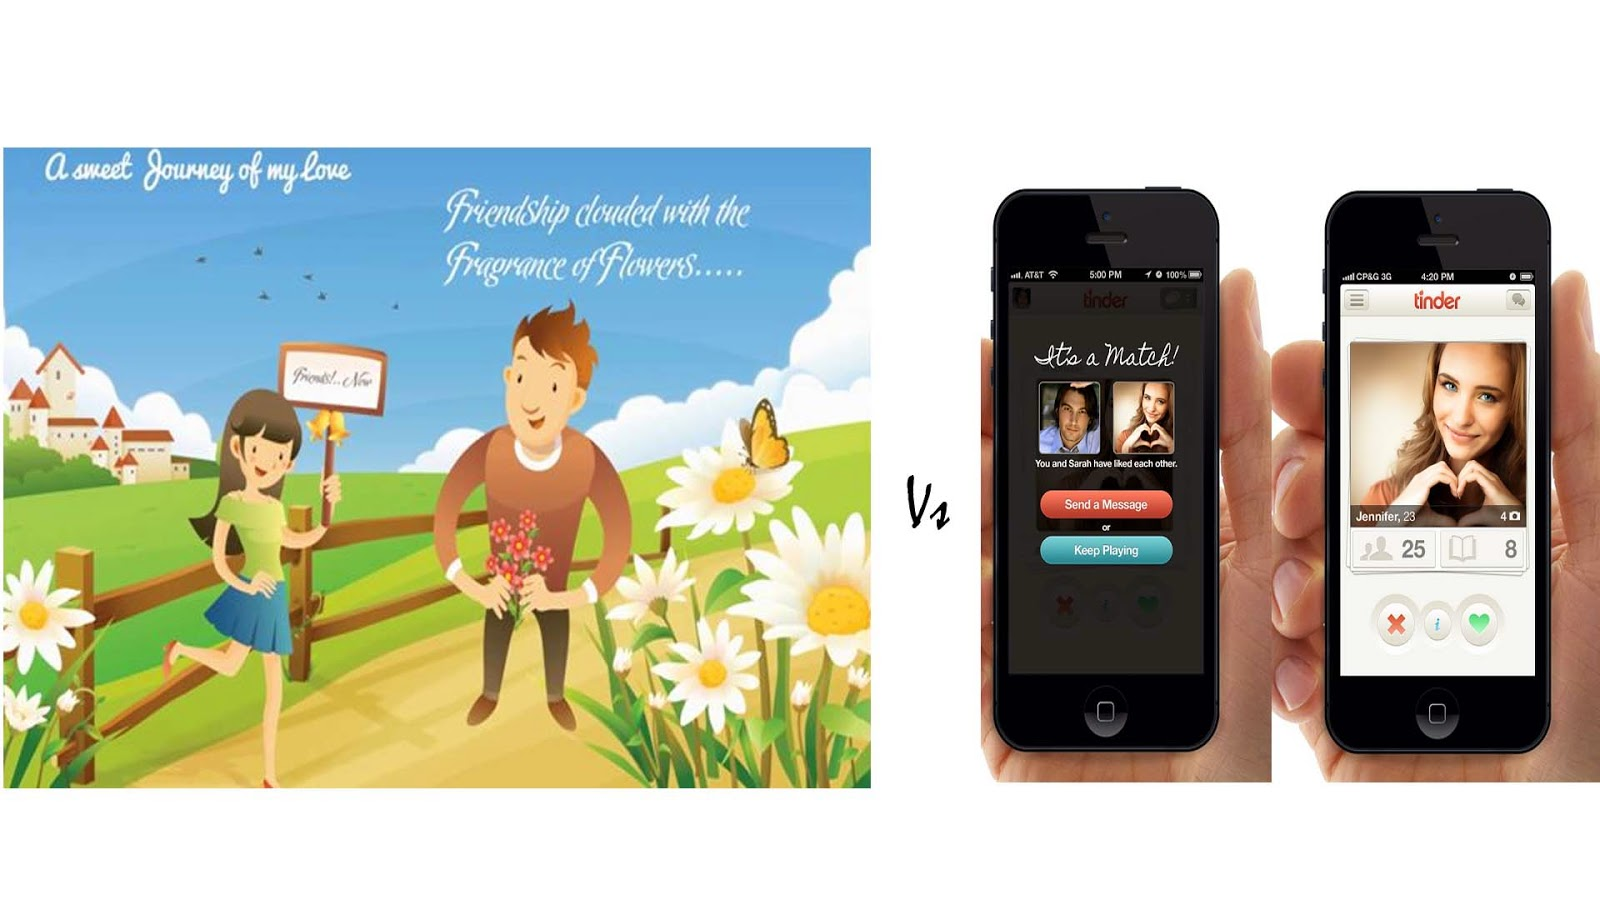 coimbatore dating app